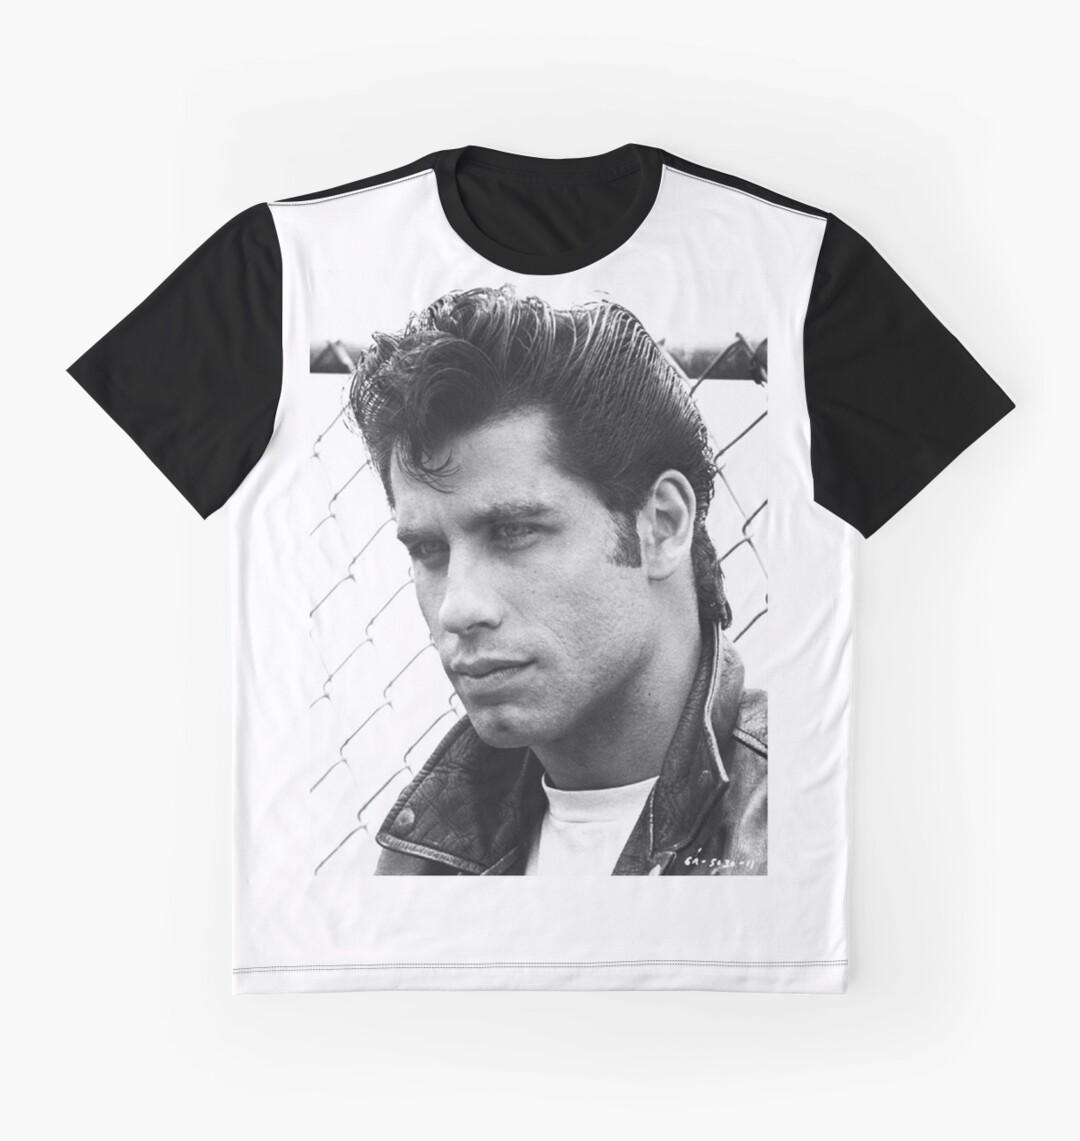 Danny zuko black t shirt - John Travolta Grease Graphic T Shirts